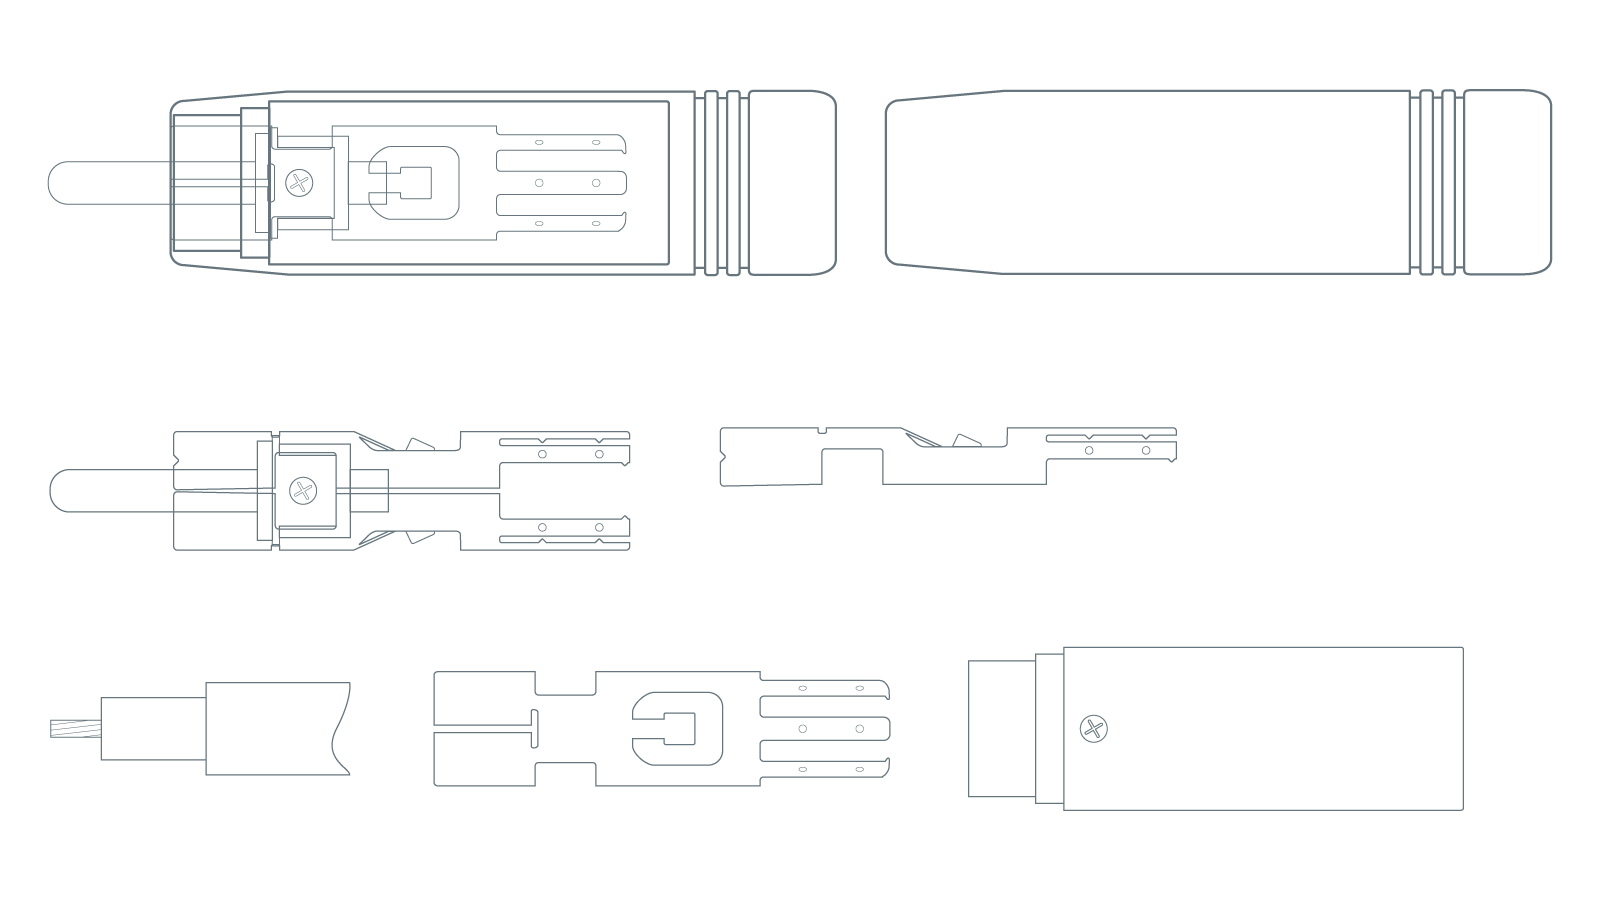 Atlas Ultra RCA Plug Technical Diagram